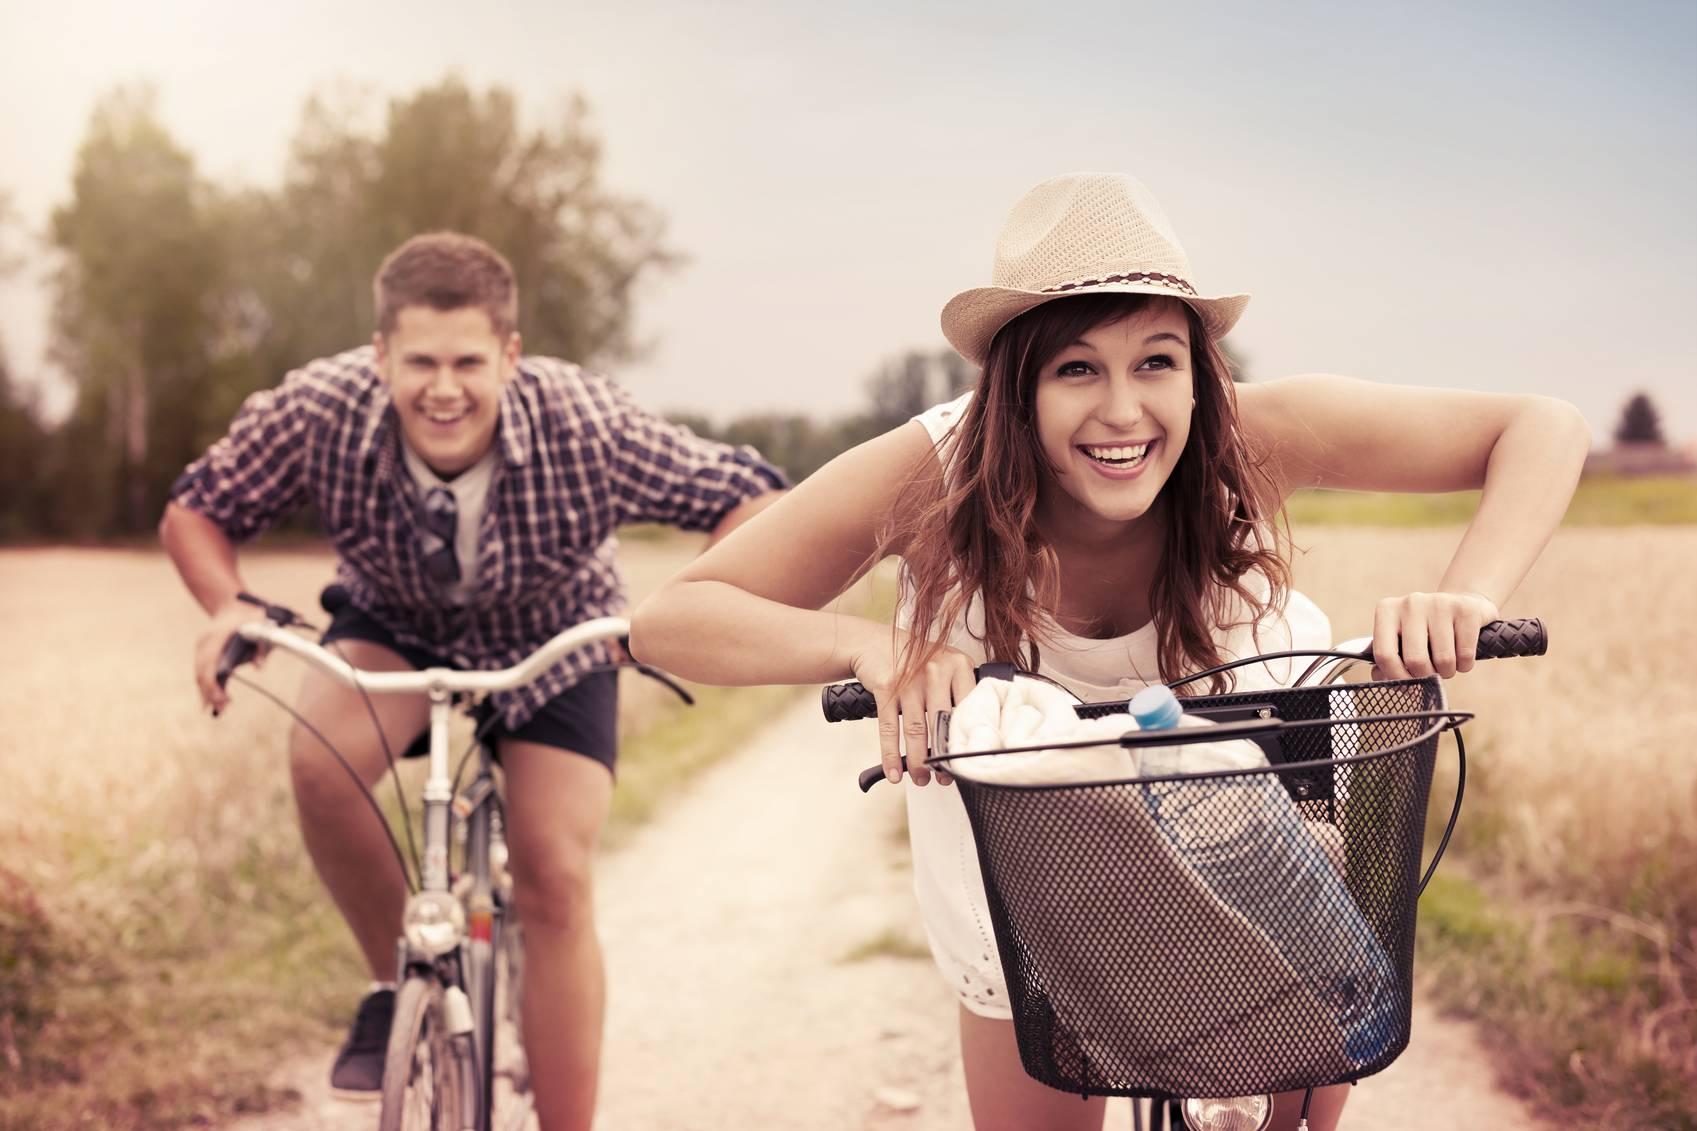 migliorare-umore-vacanze